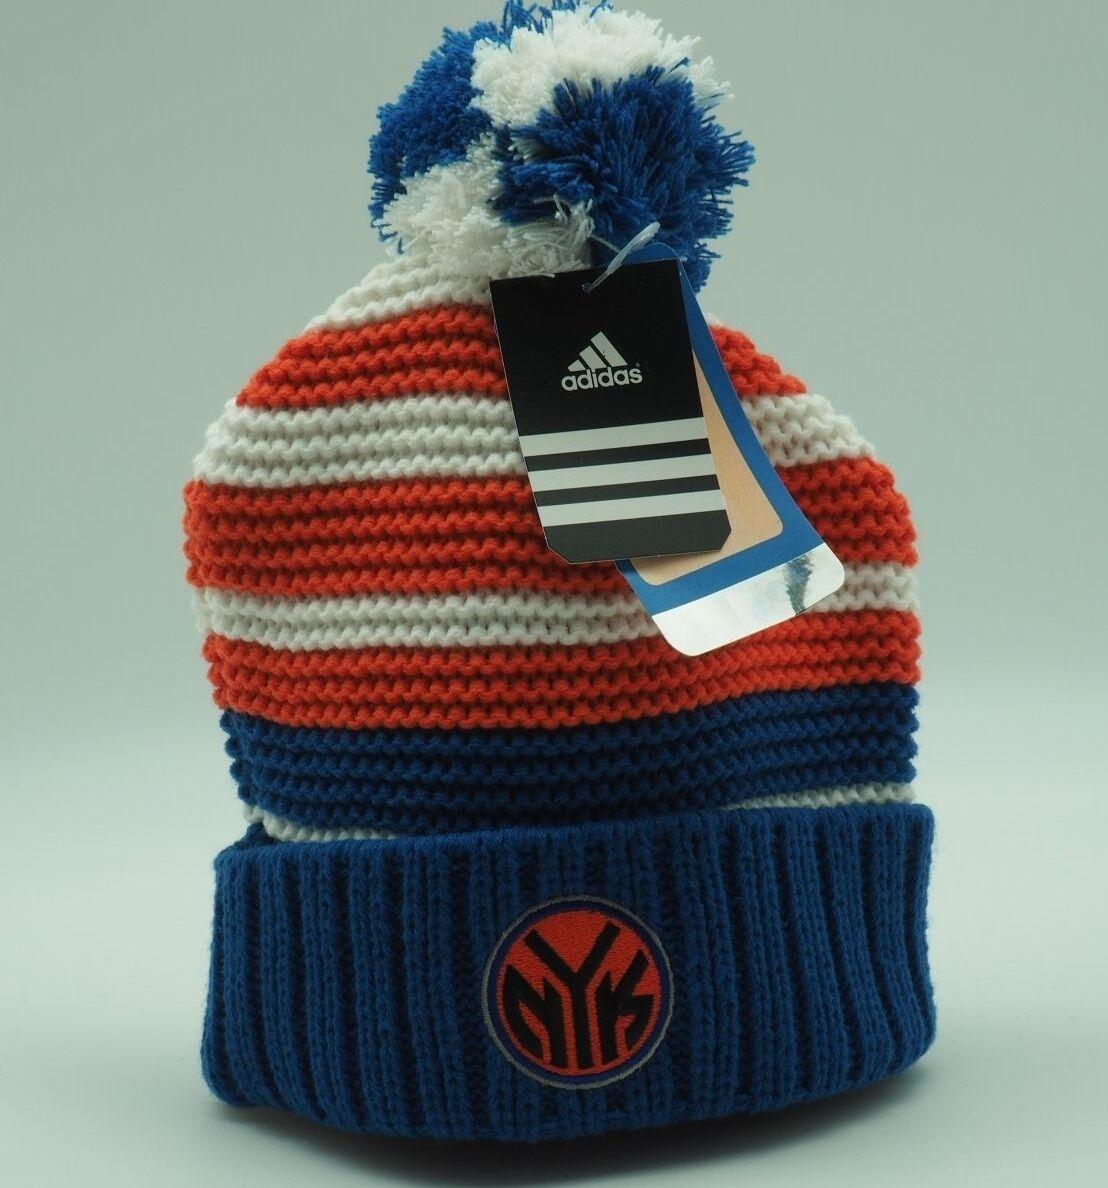 59b2d1b63 Details about New York Knicks Youth Girls Adidas NBA Knit Cuffed Pom Knit  Hat Girls 7-16